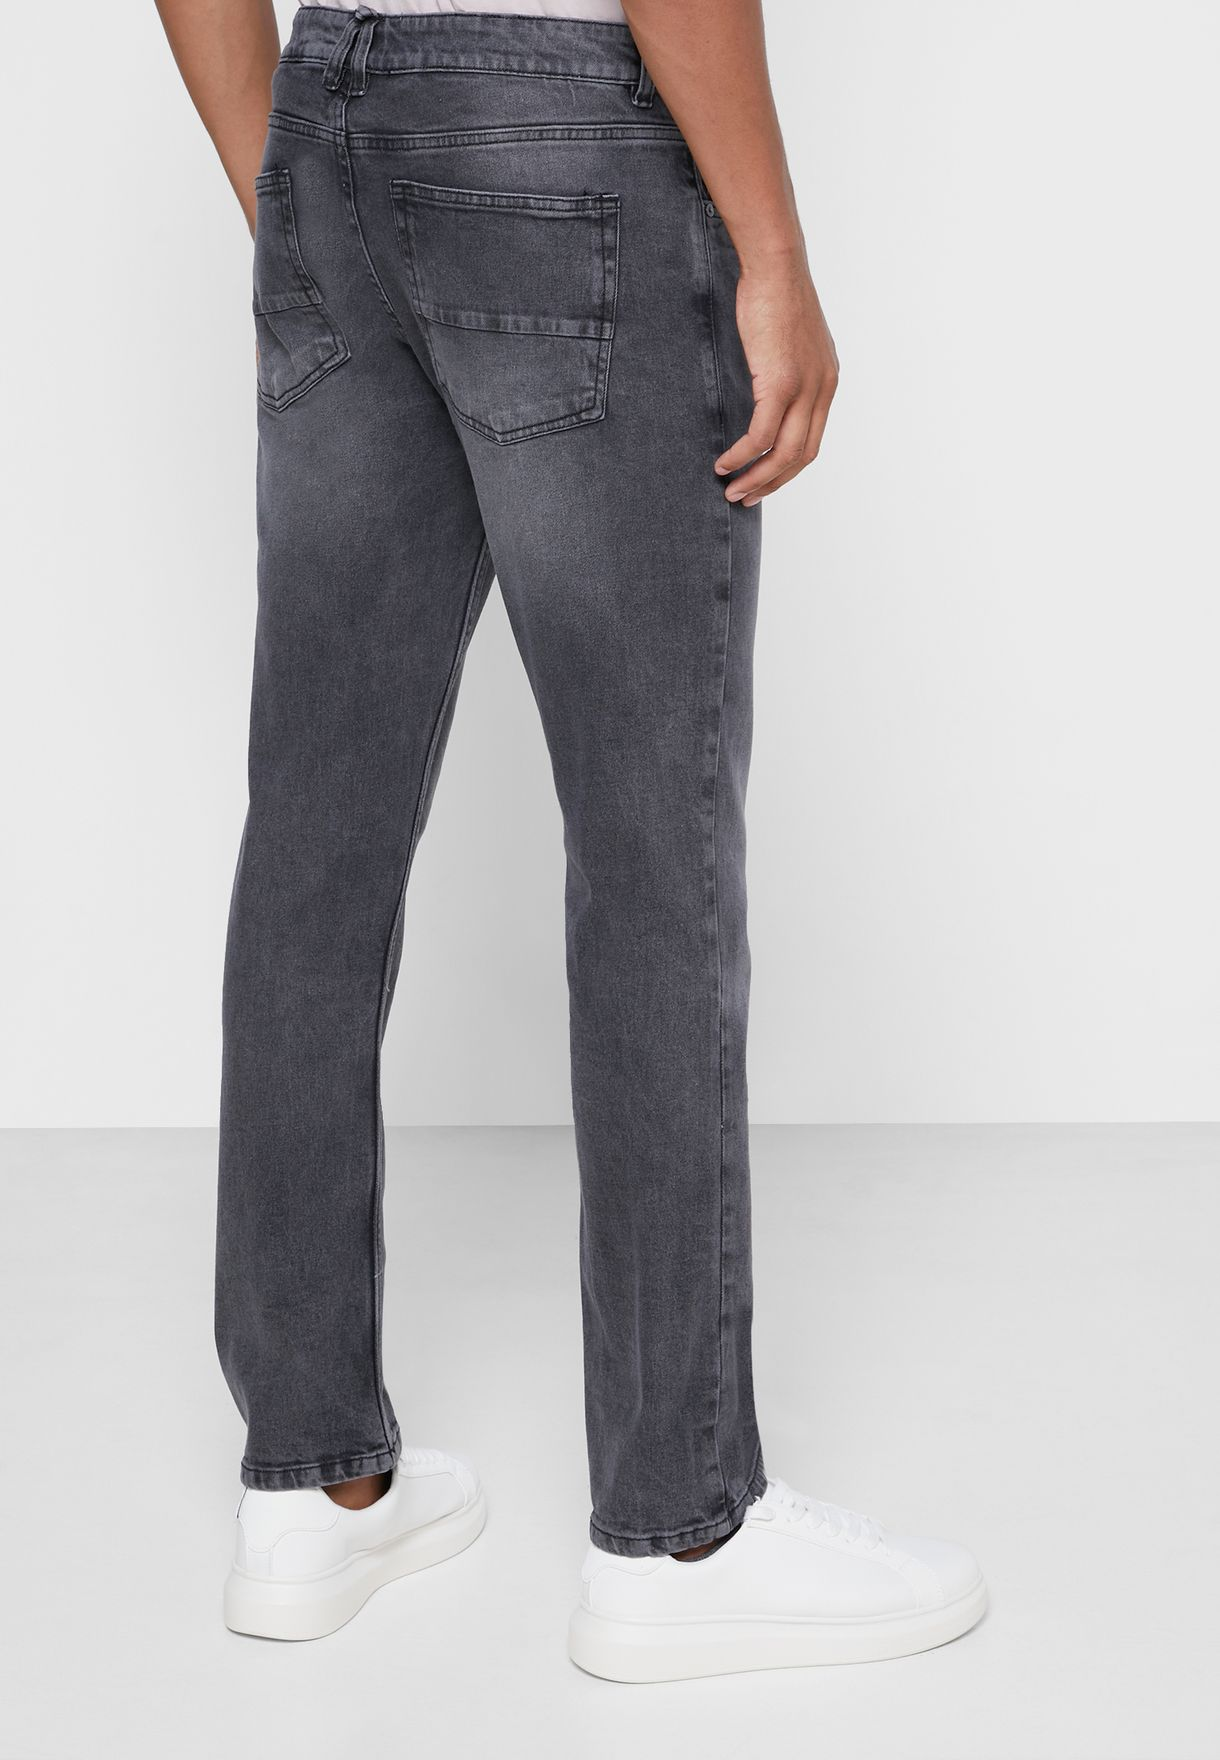 Washed Slim Fit Jean